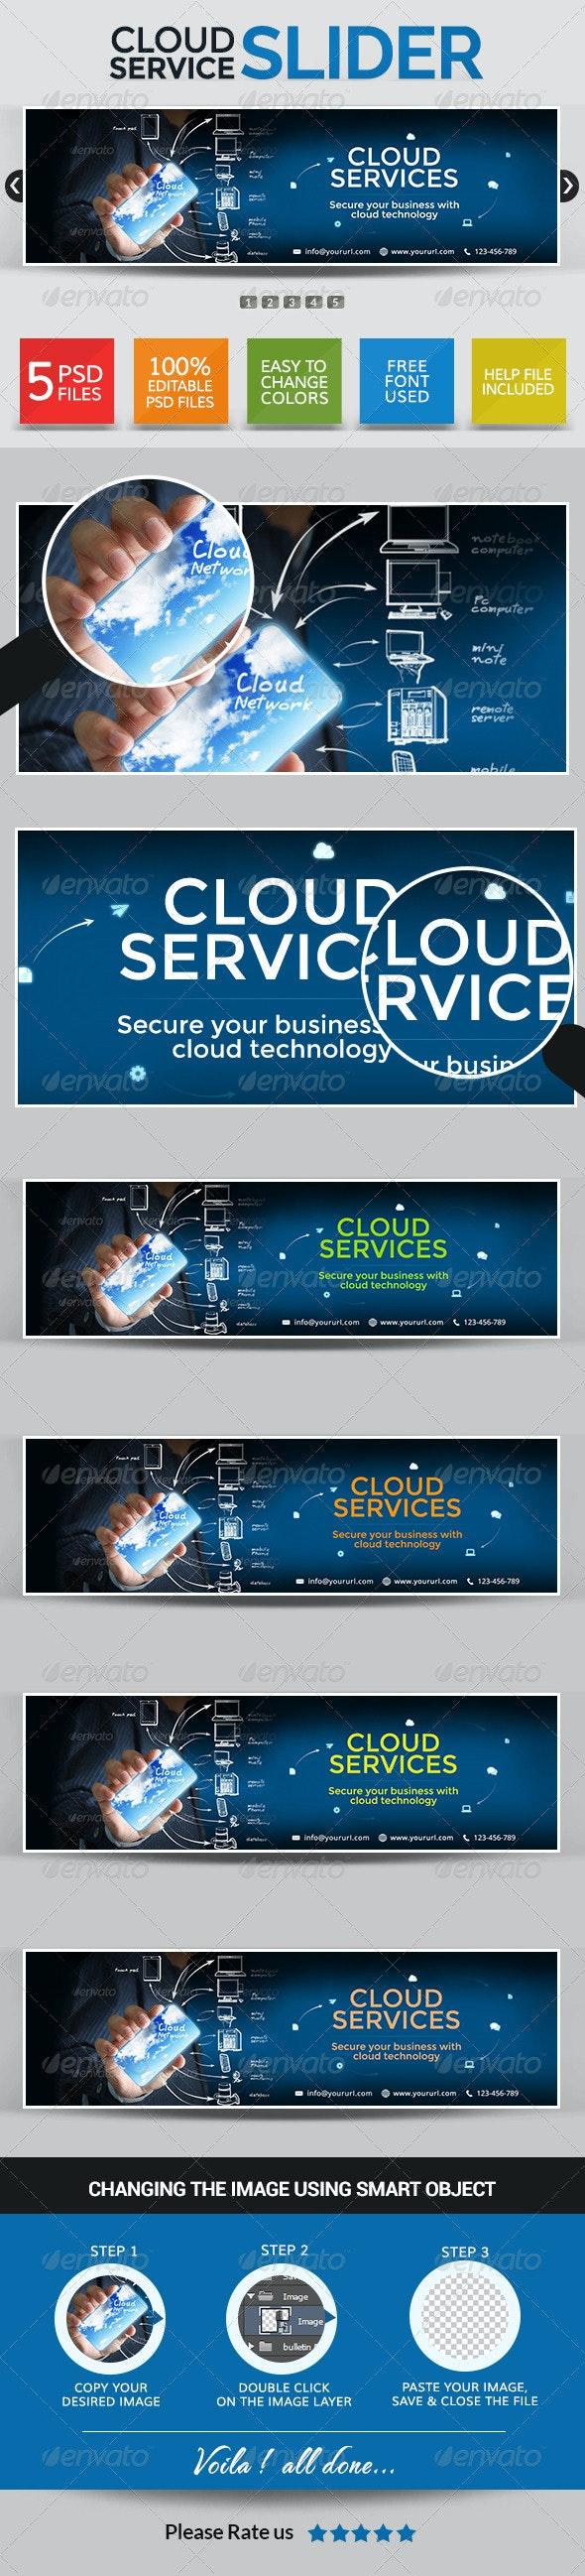 Cloud Services Web Sliders - Sliders & Features Web Elements